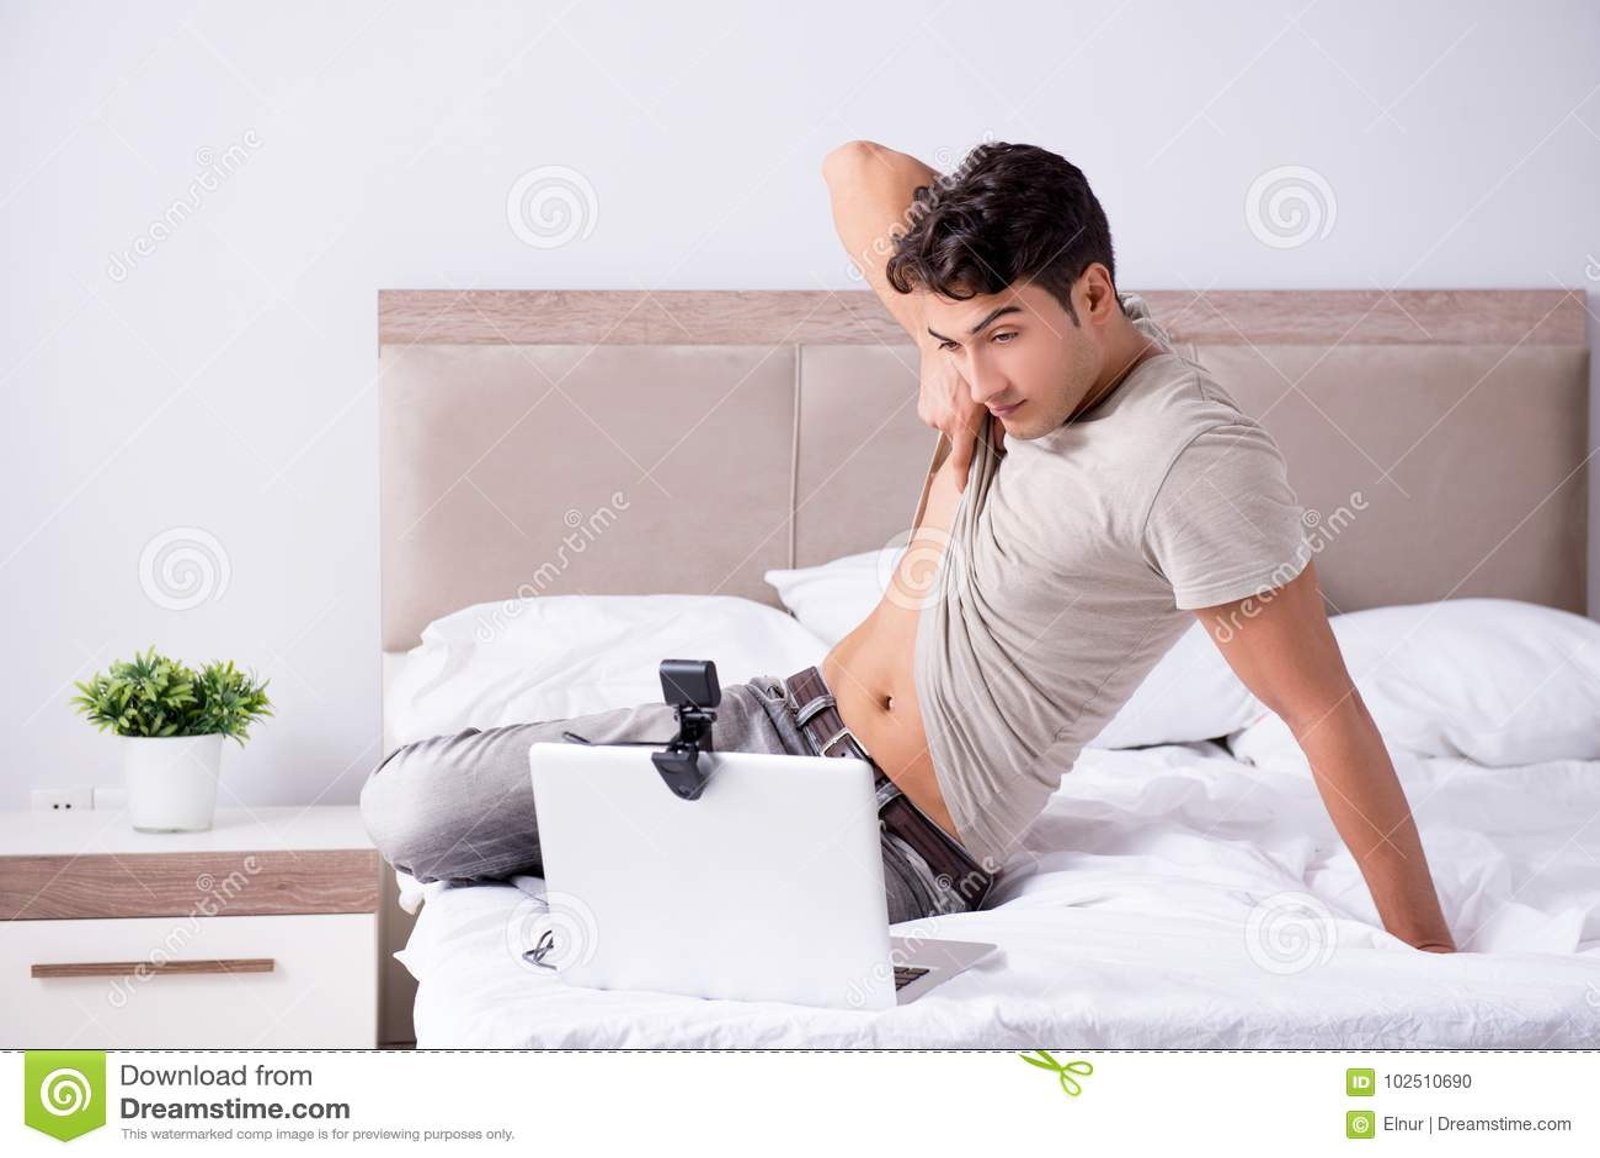 Online dating fight scene notebook